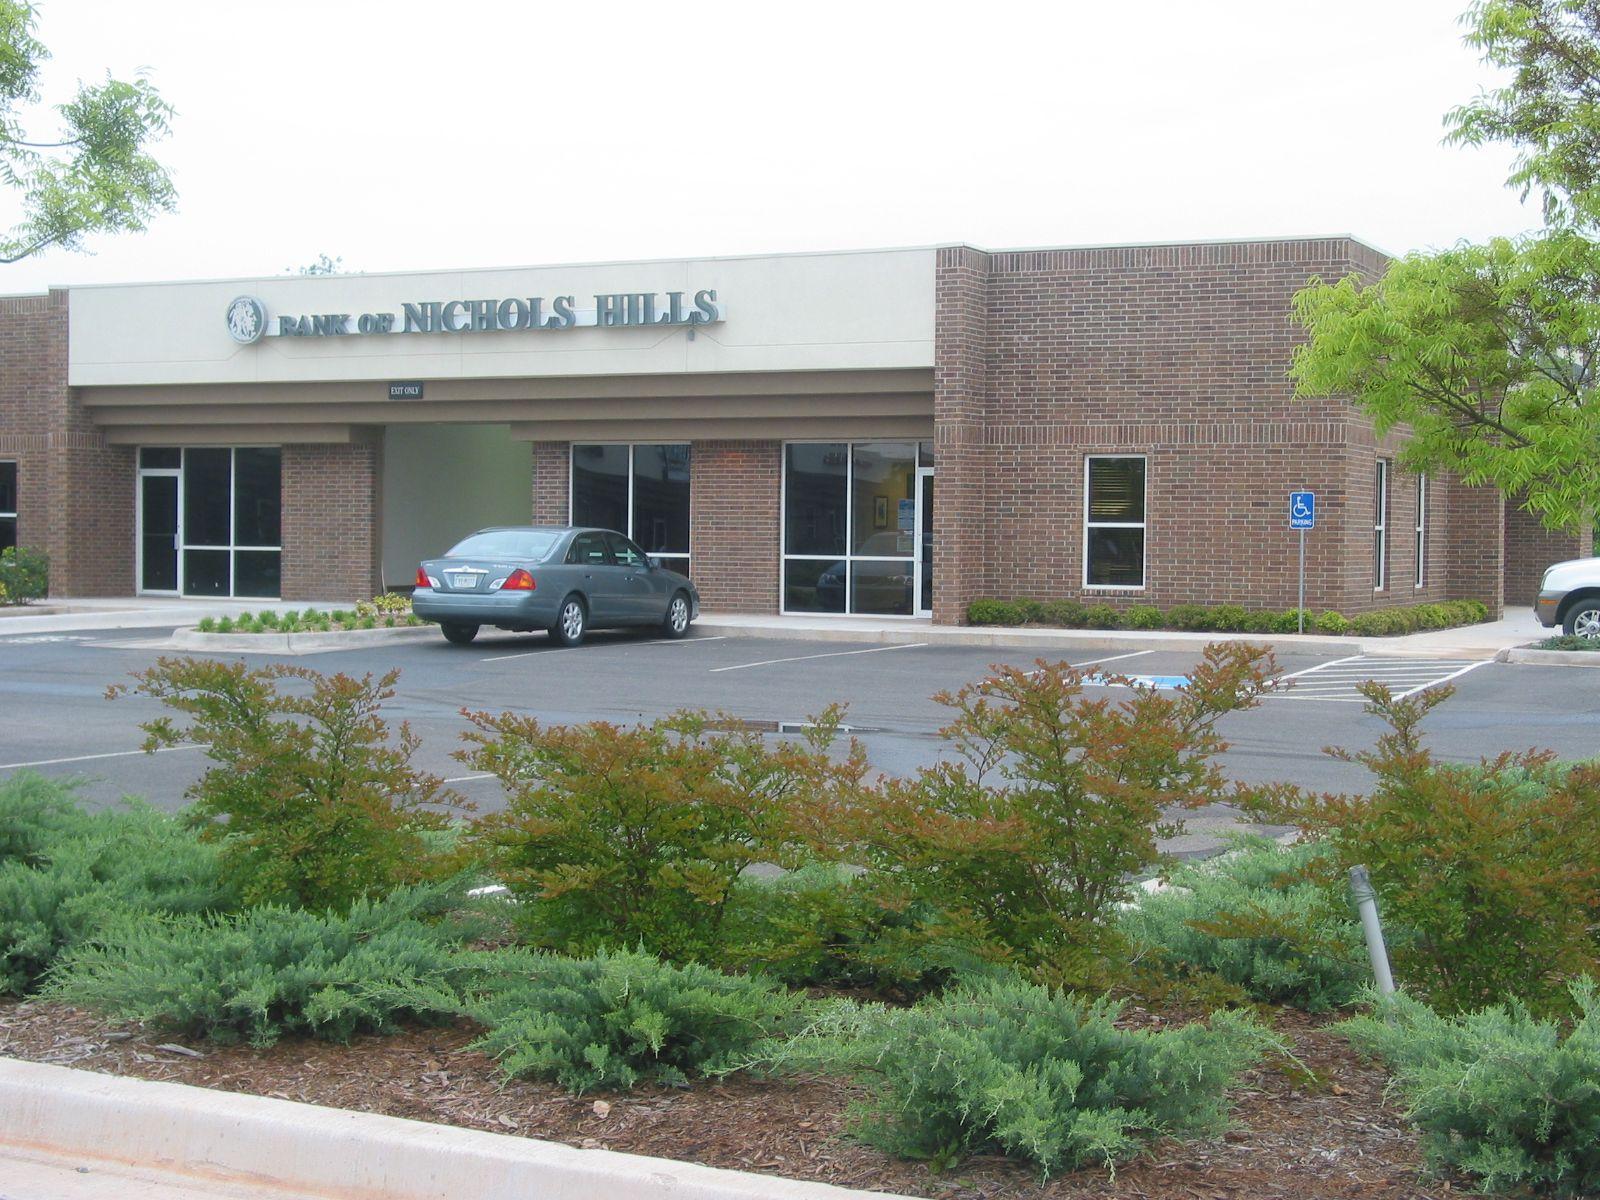 FT-Bank of Nichols Hills-Edmond